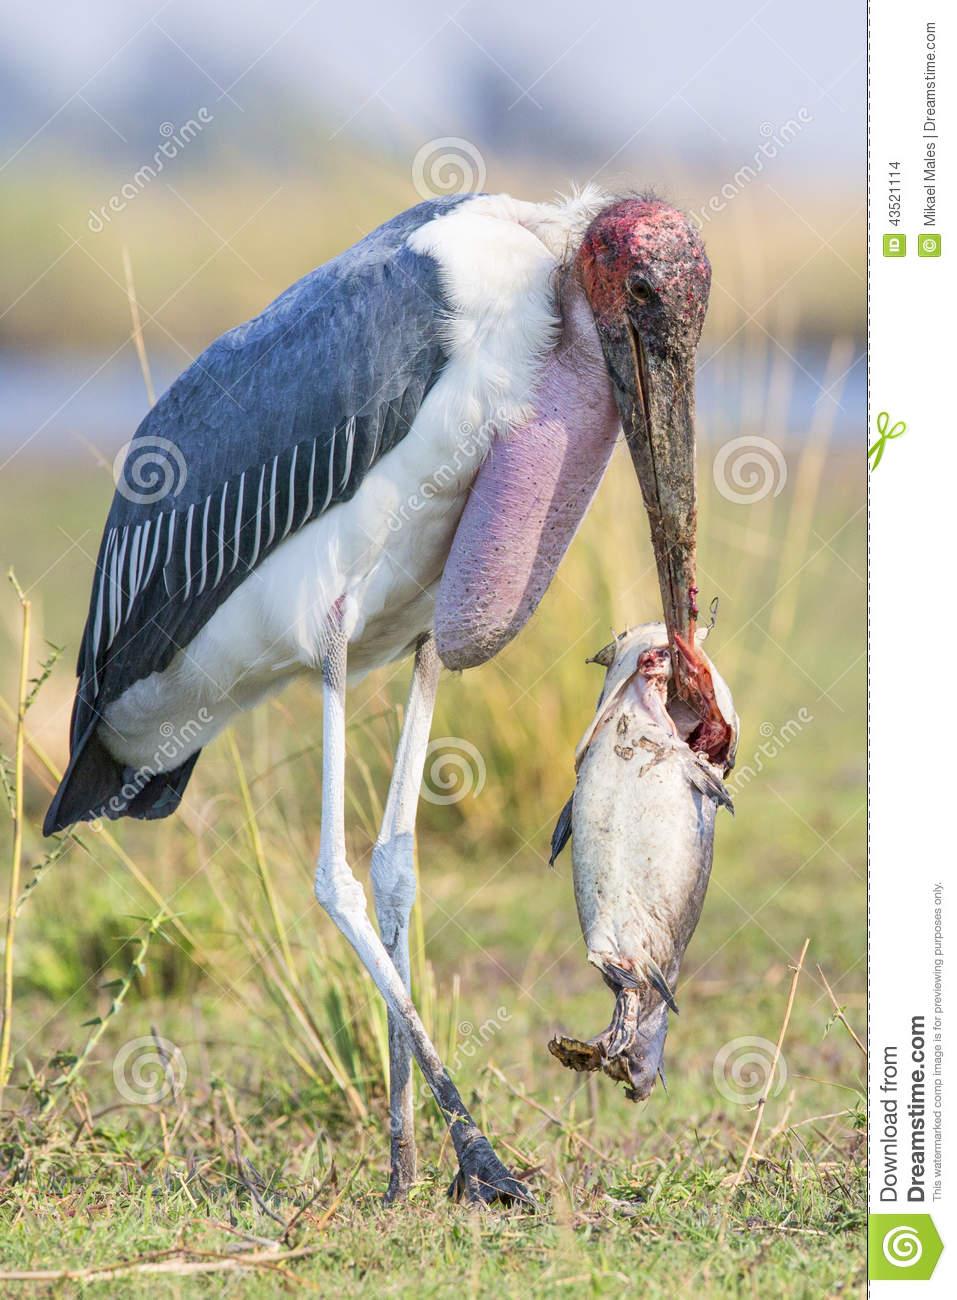 Marabou Stork With Huge Catfish In Beak Stock Photo.